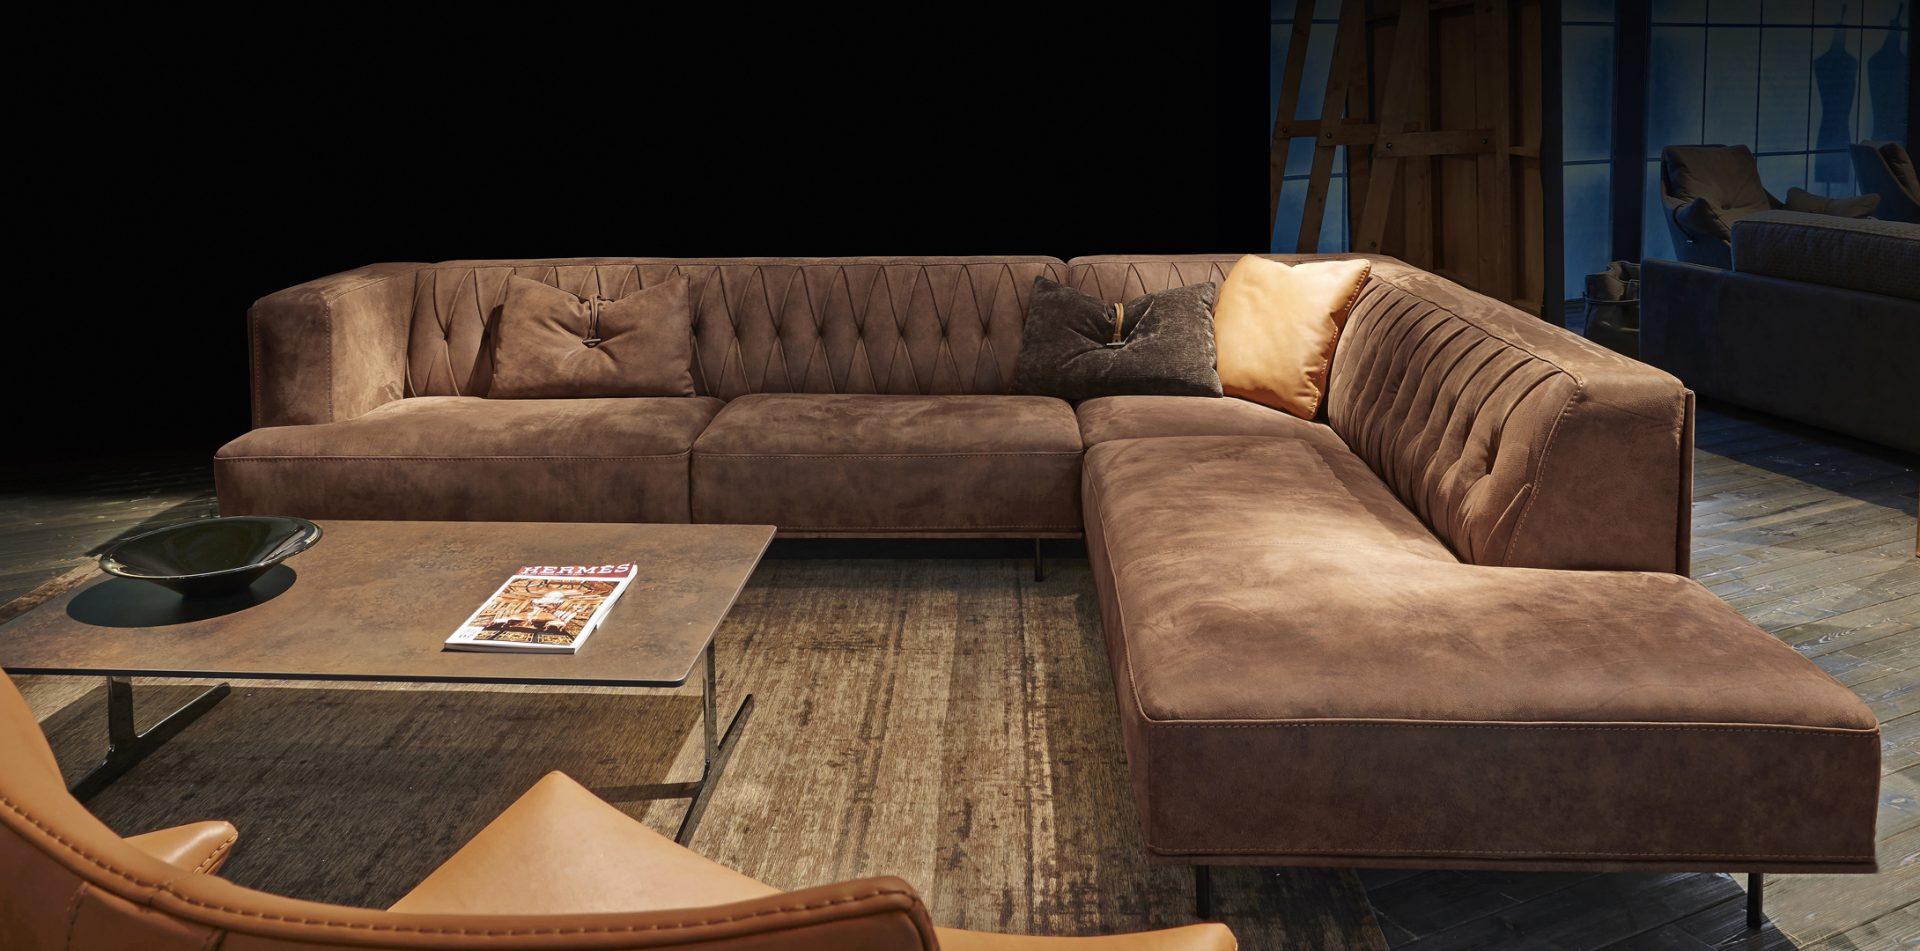 McQueen Lounge